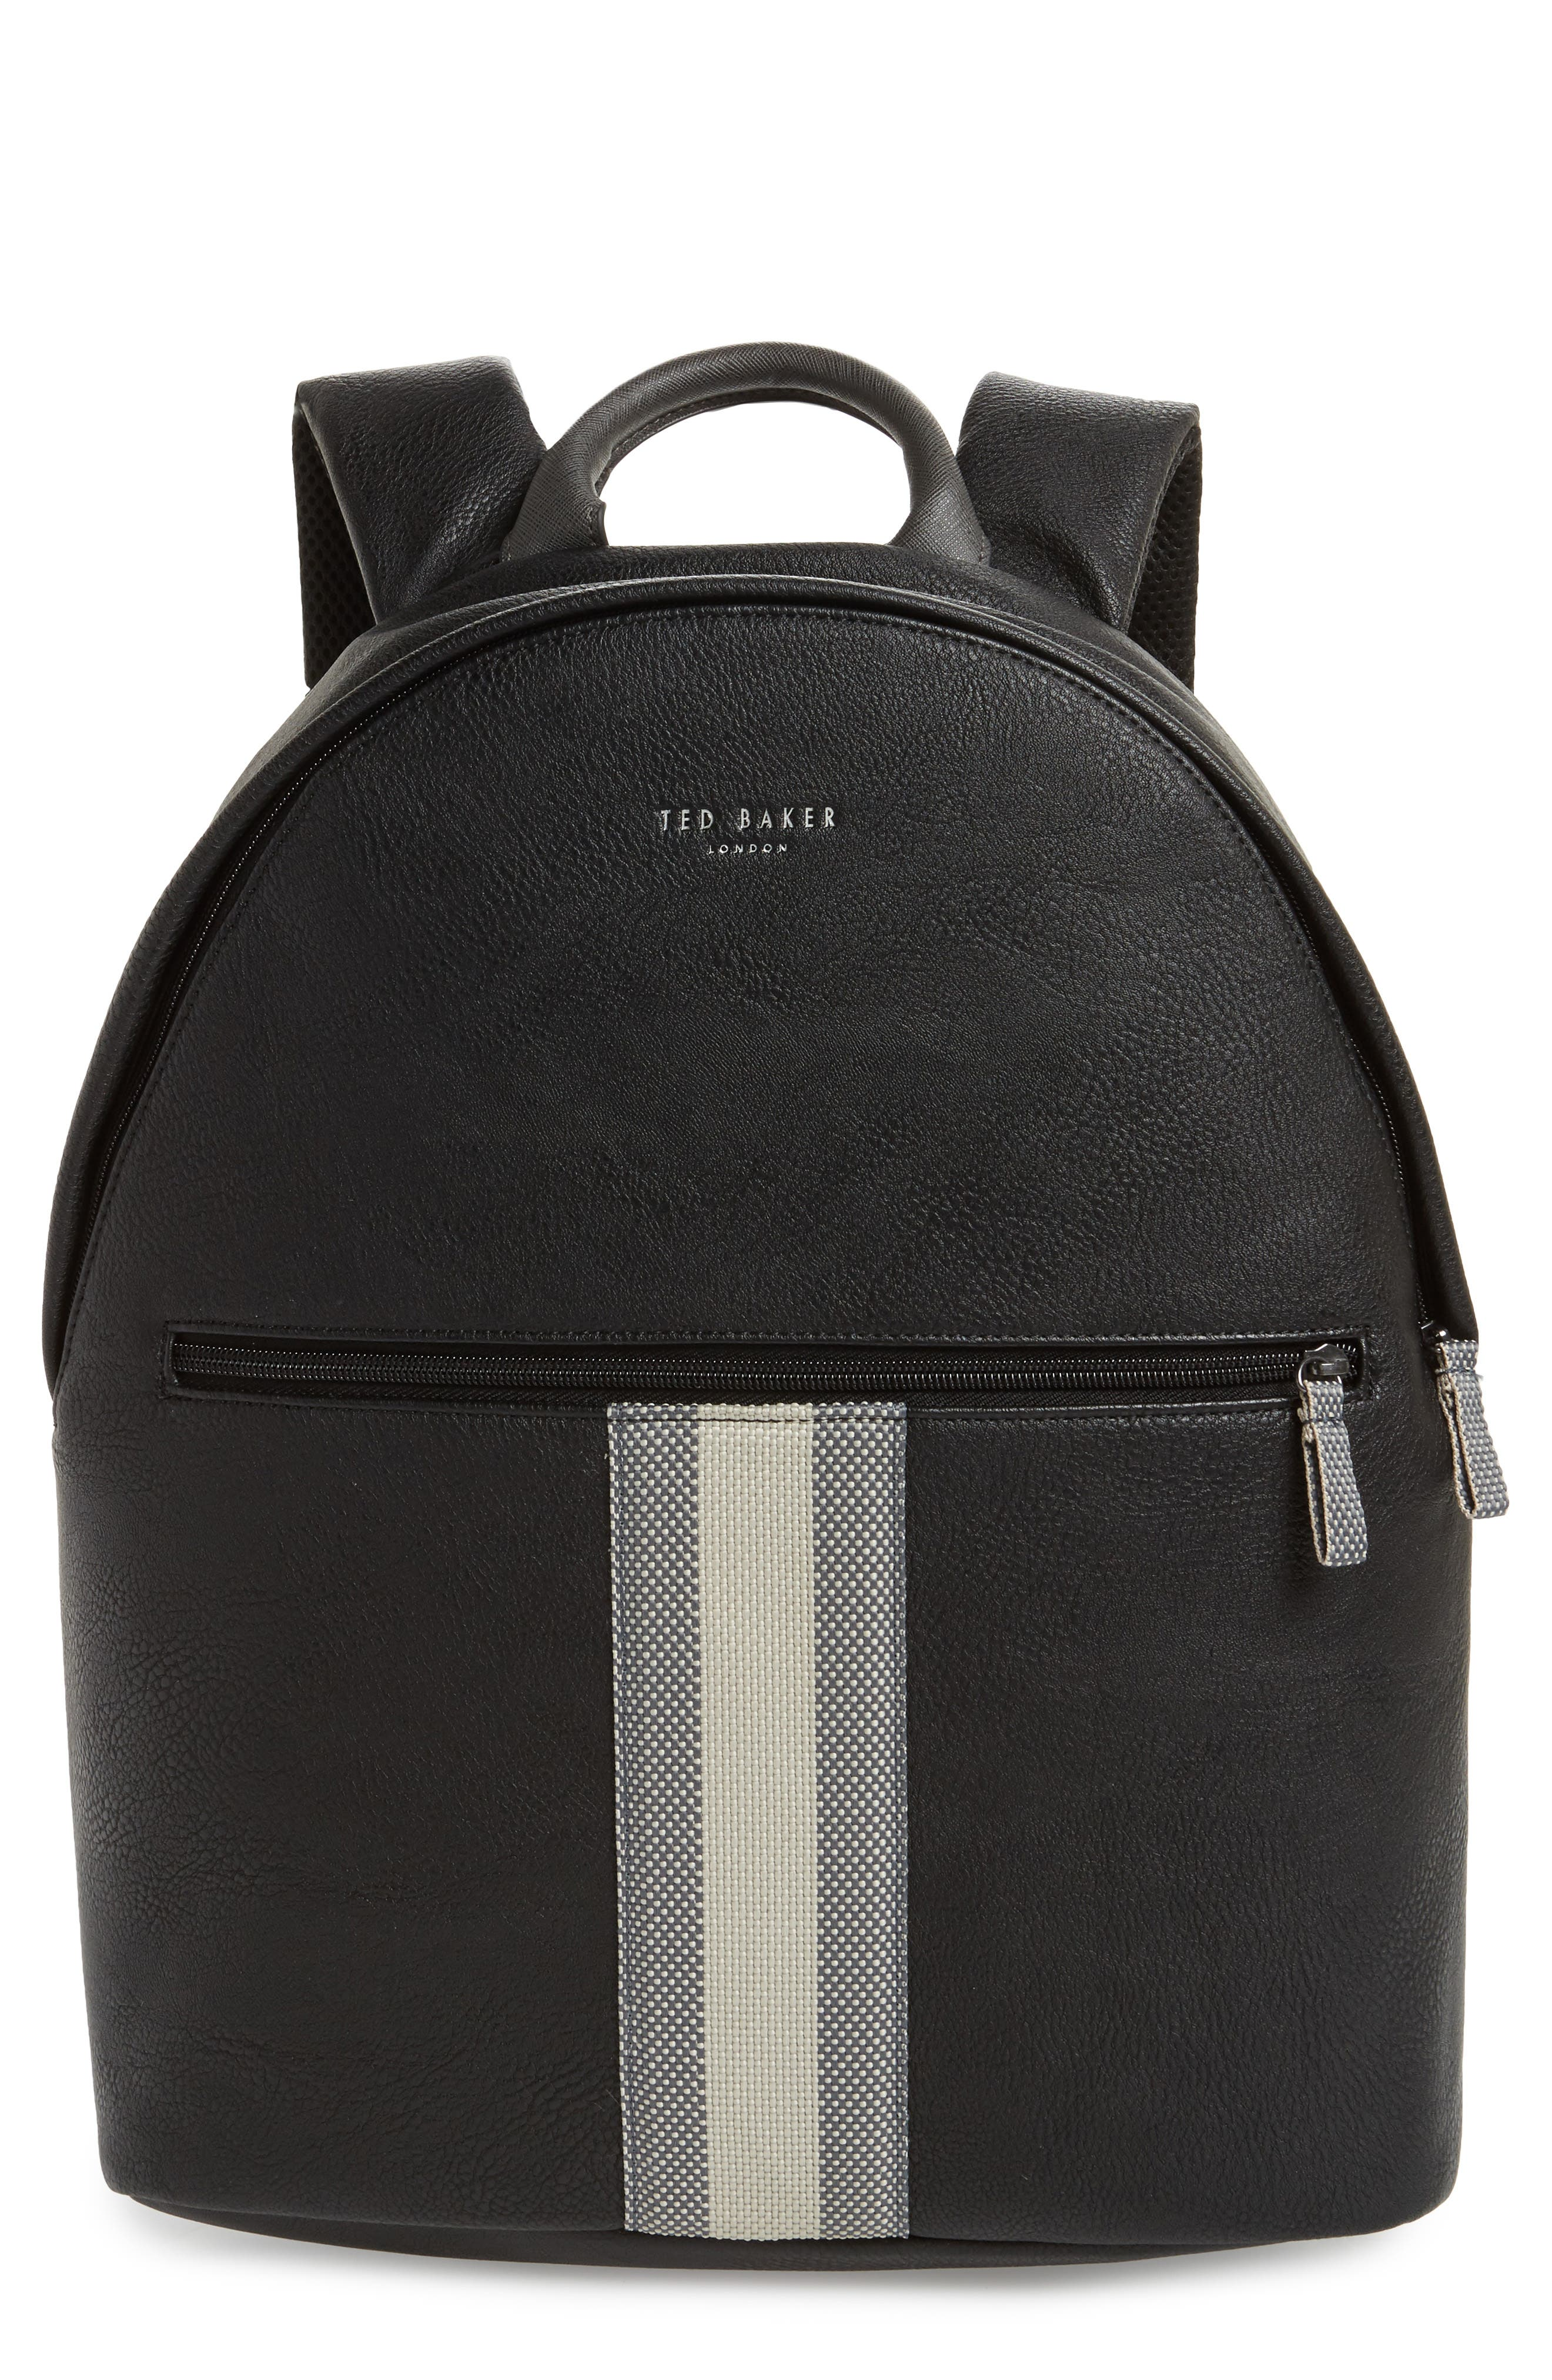 Royale Backpack,                             Main thumbnail 1, color,